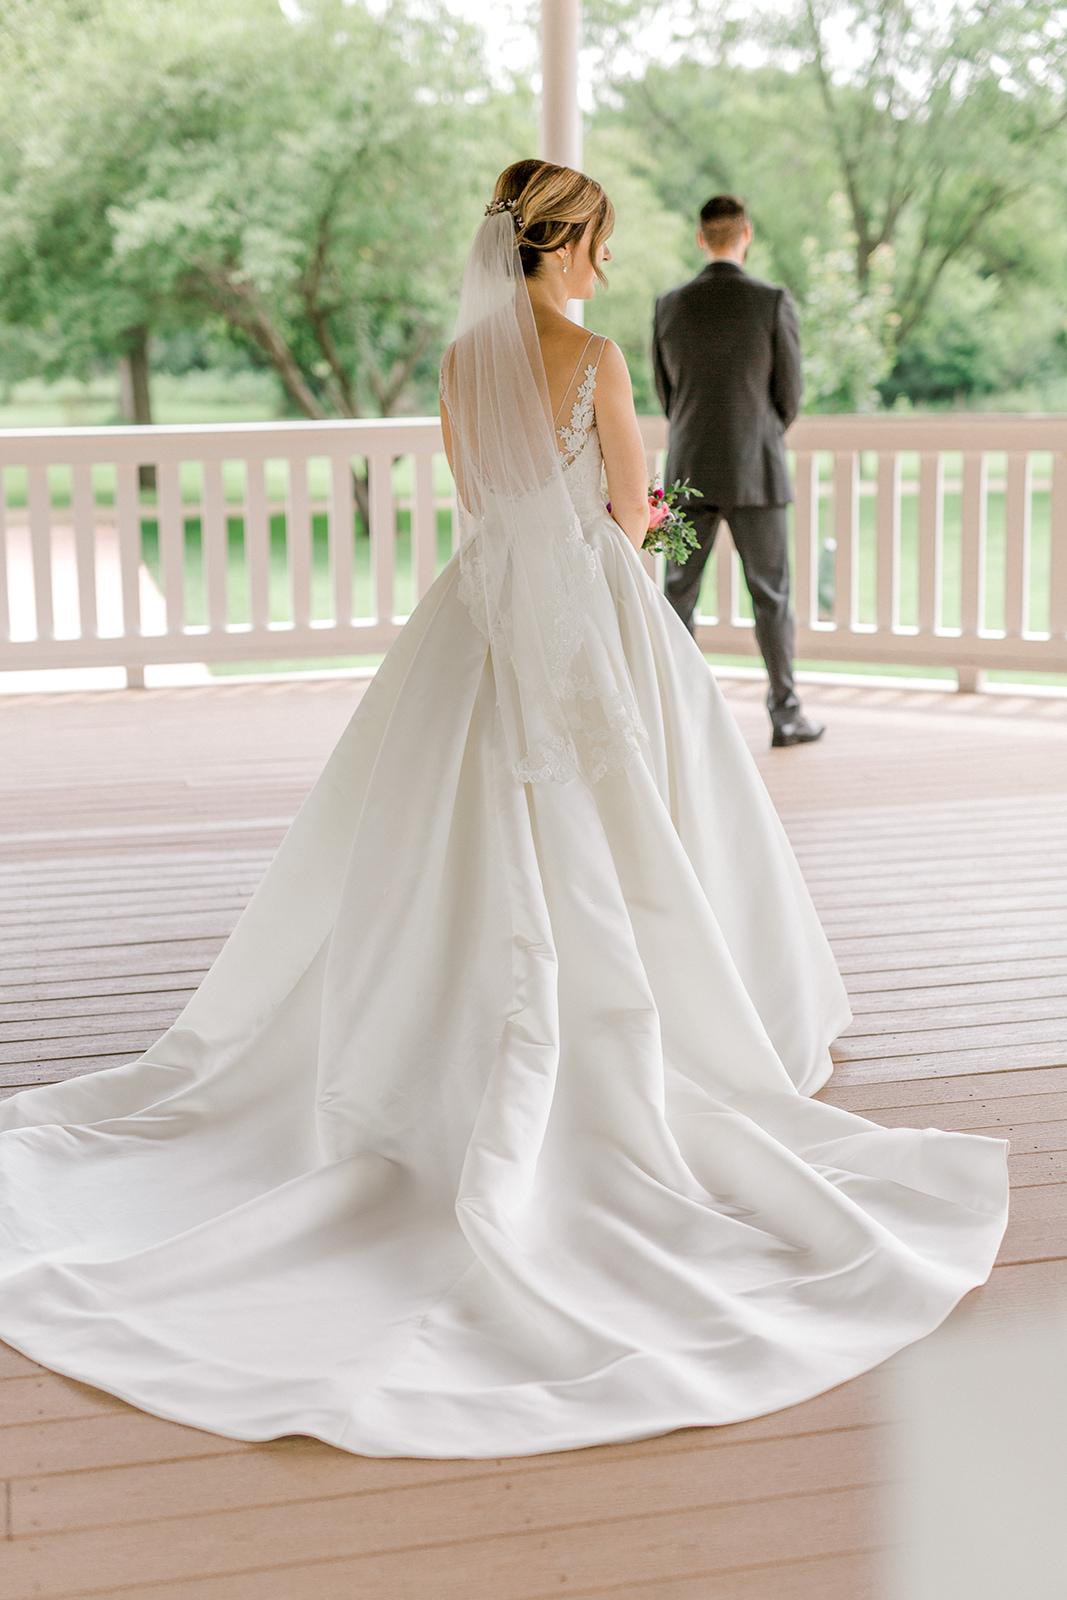 Ushers_Ferry_Cedar_Rapids_Wedding_Ella+Phil-0353.jpg